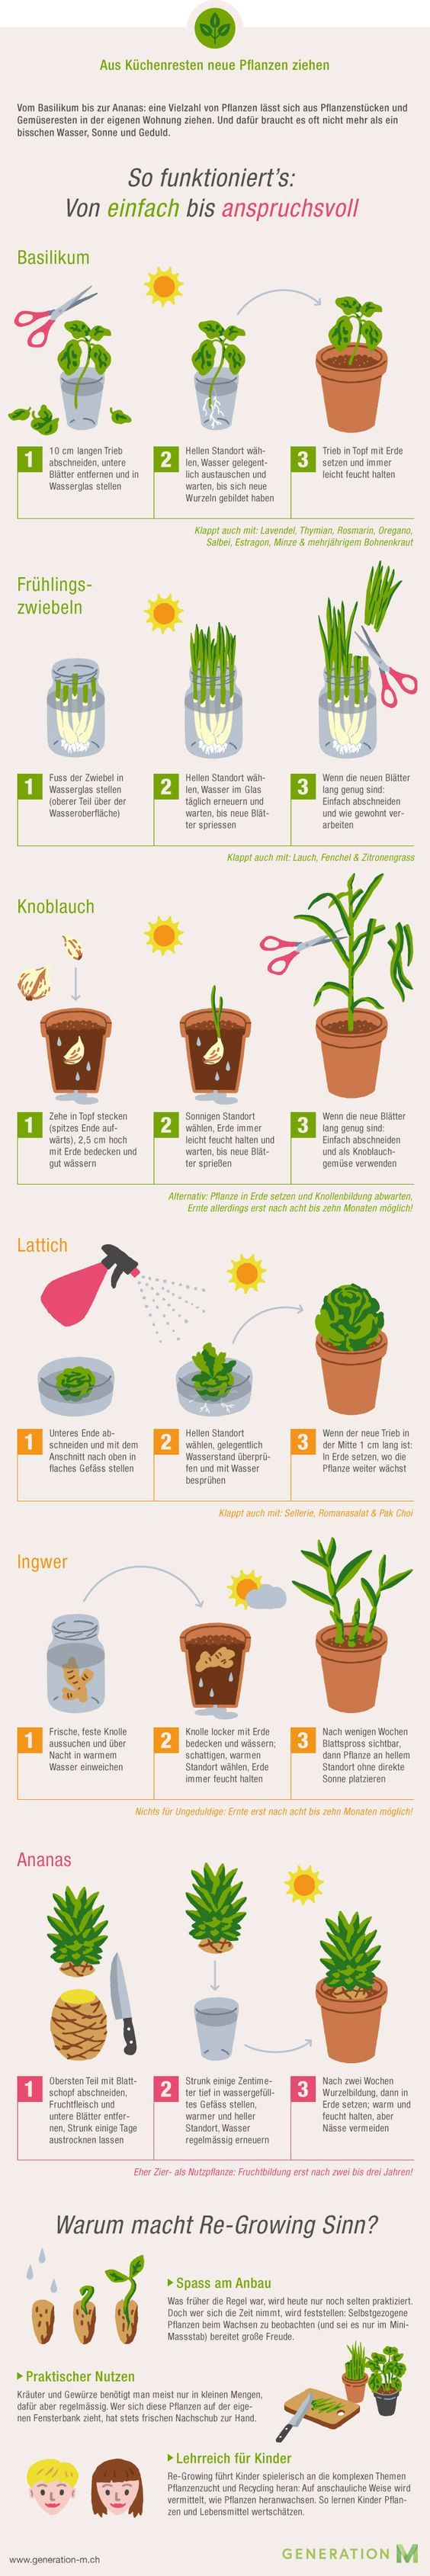 Best 25 Garten images on Pinterest | Garden deco, Garden ideas and ...